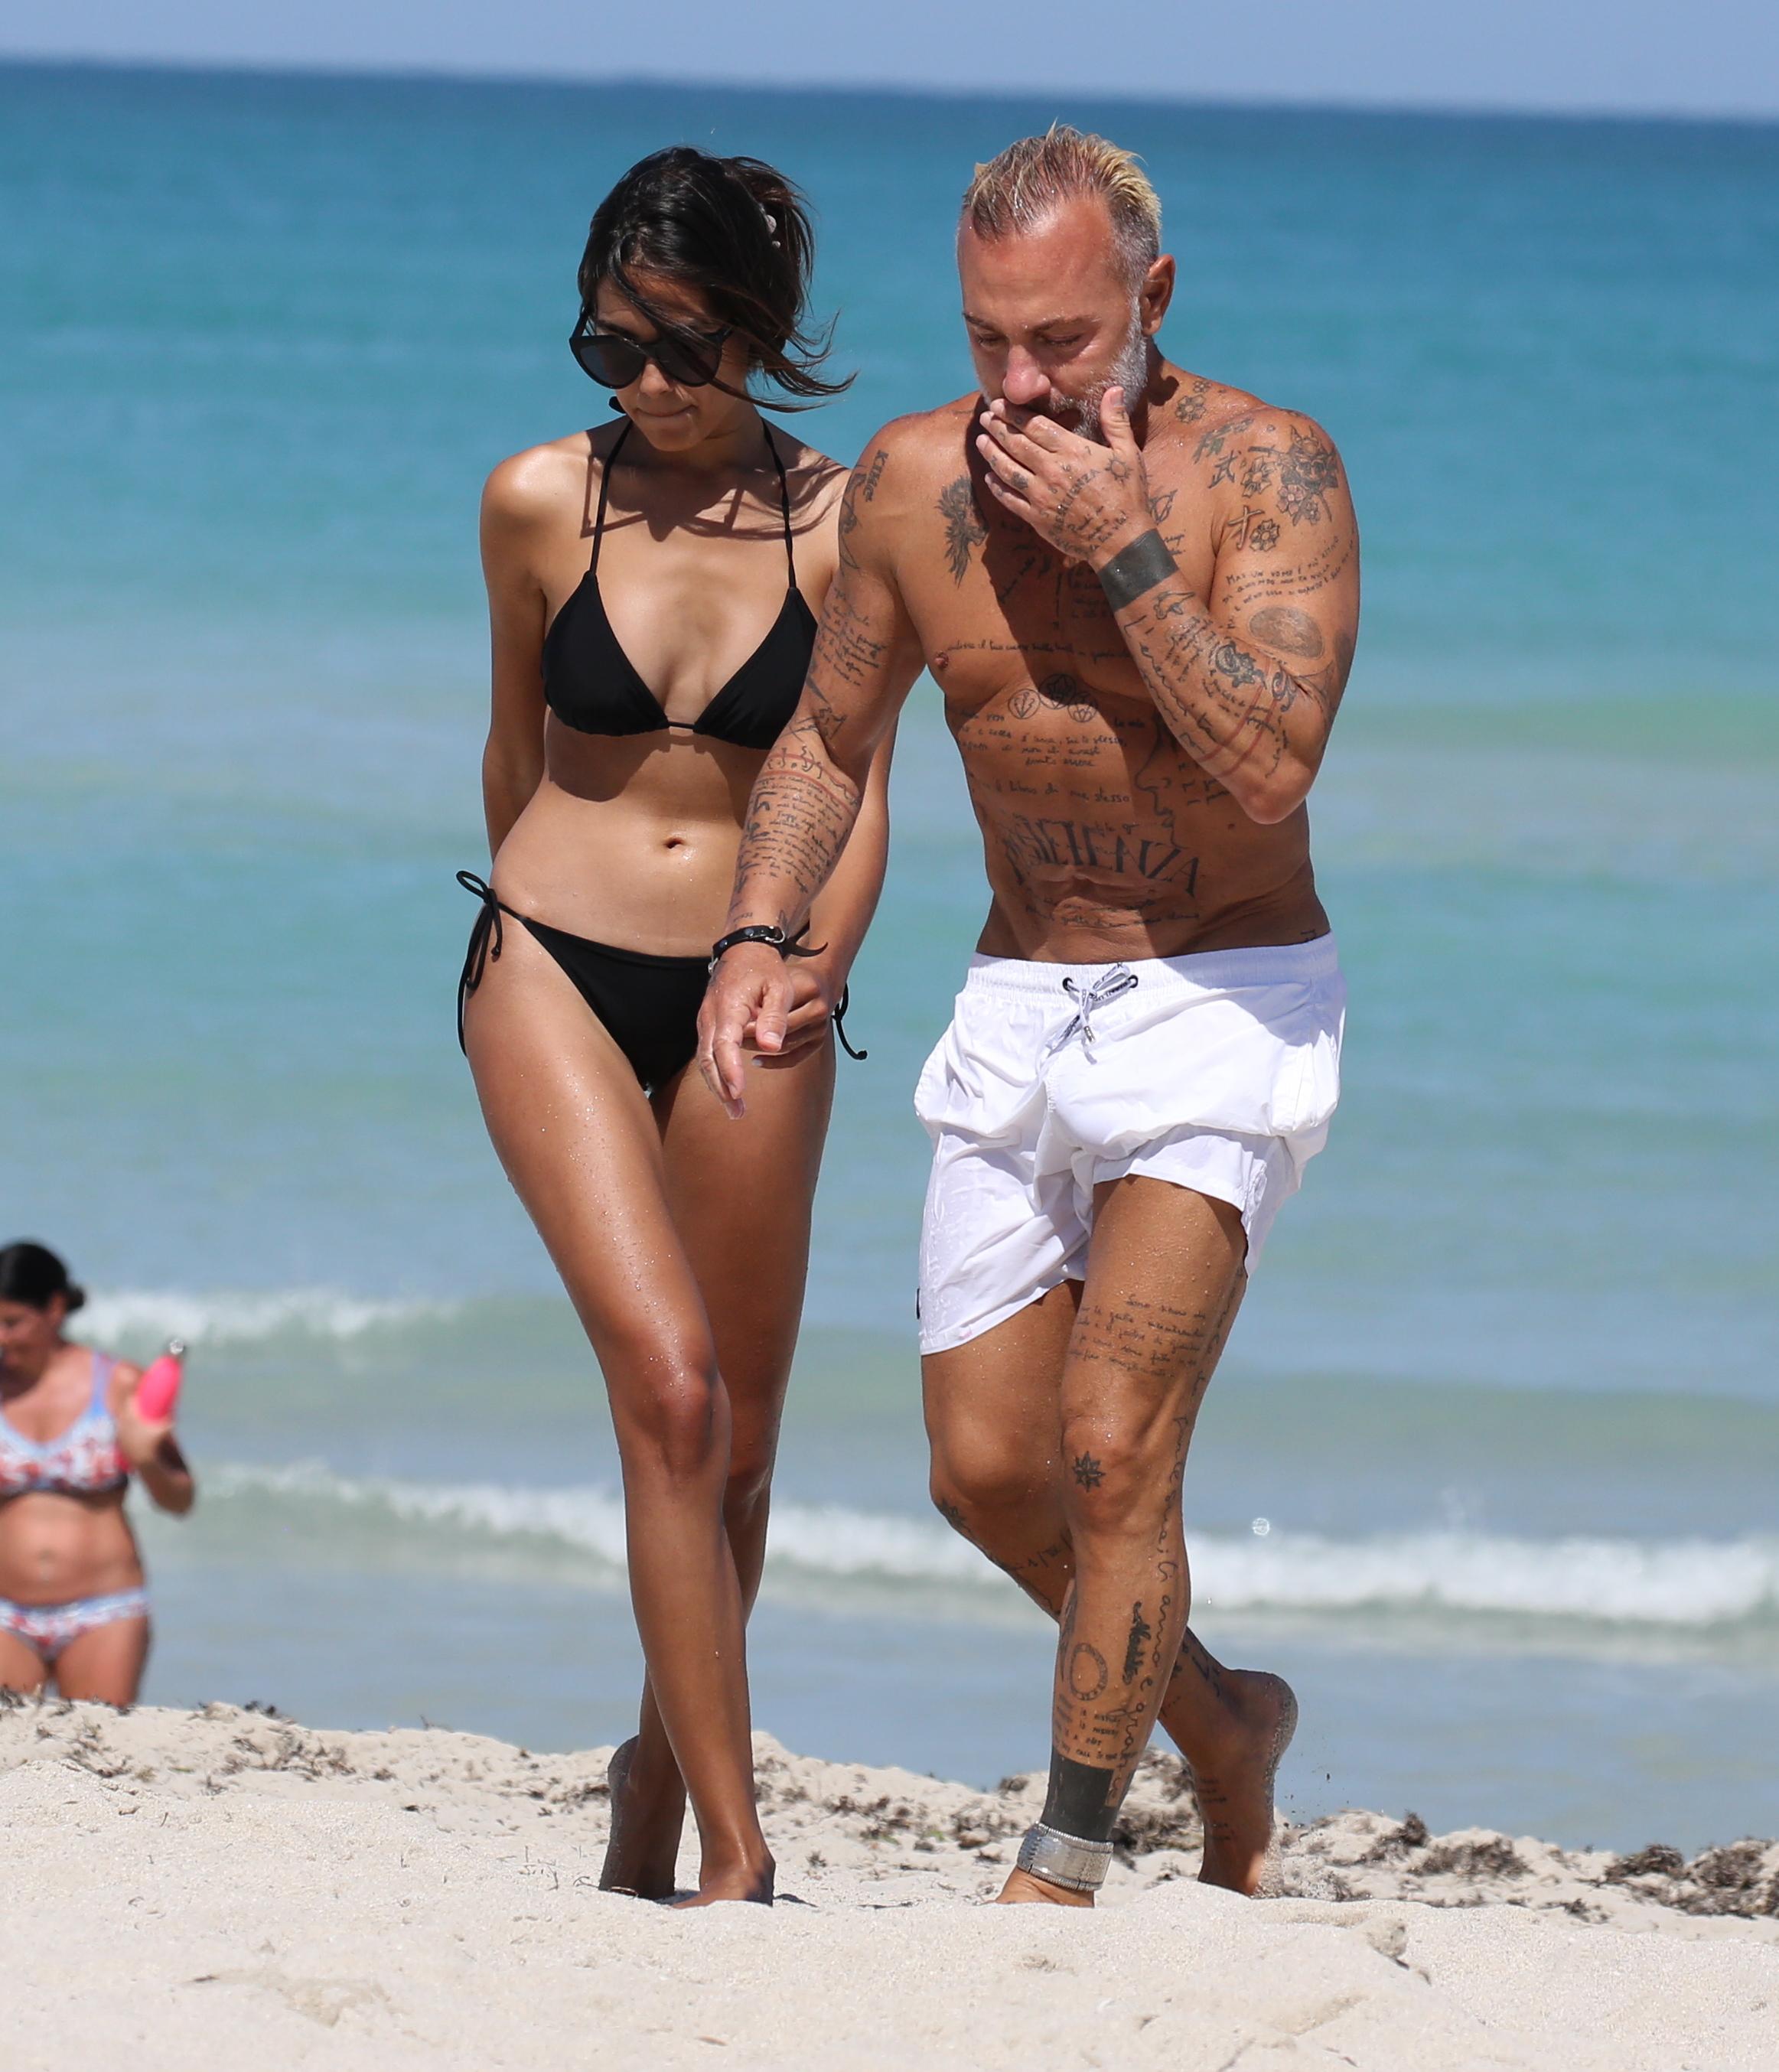 Sharon Fonseca nudes (48 photo), Tits, Leaked, Twitter, bra 2019